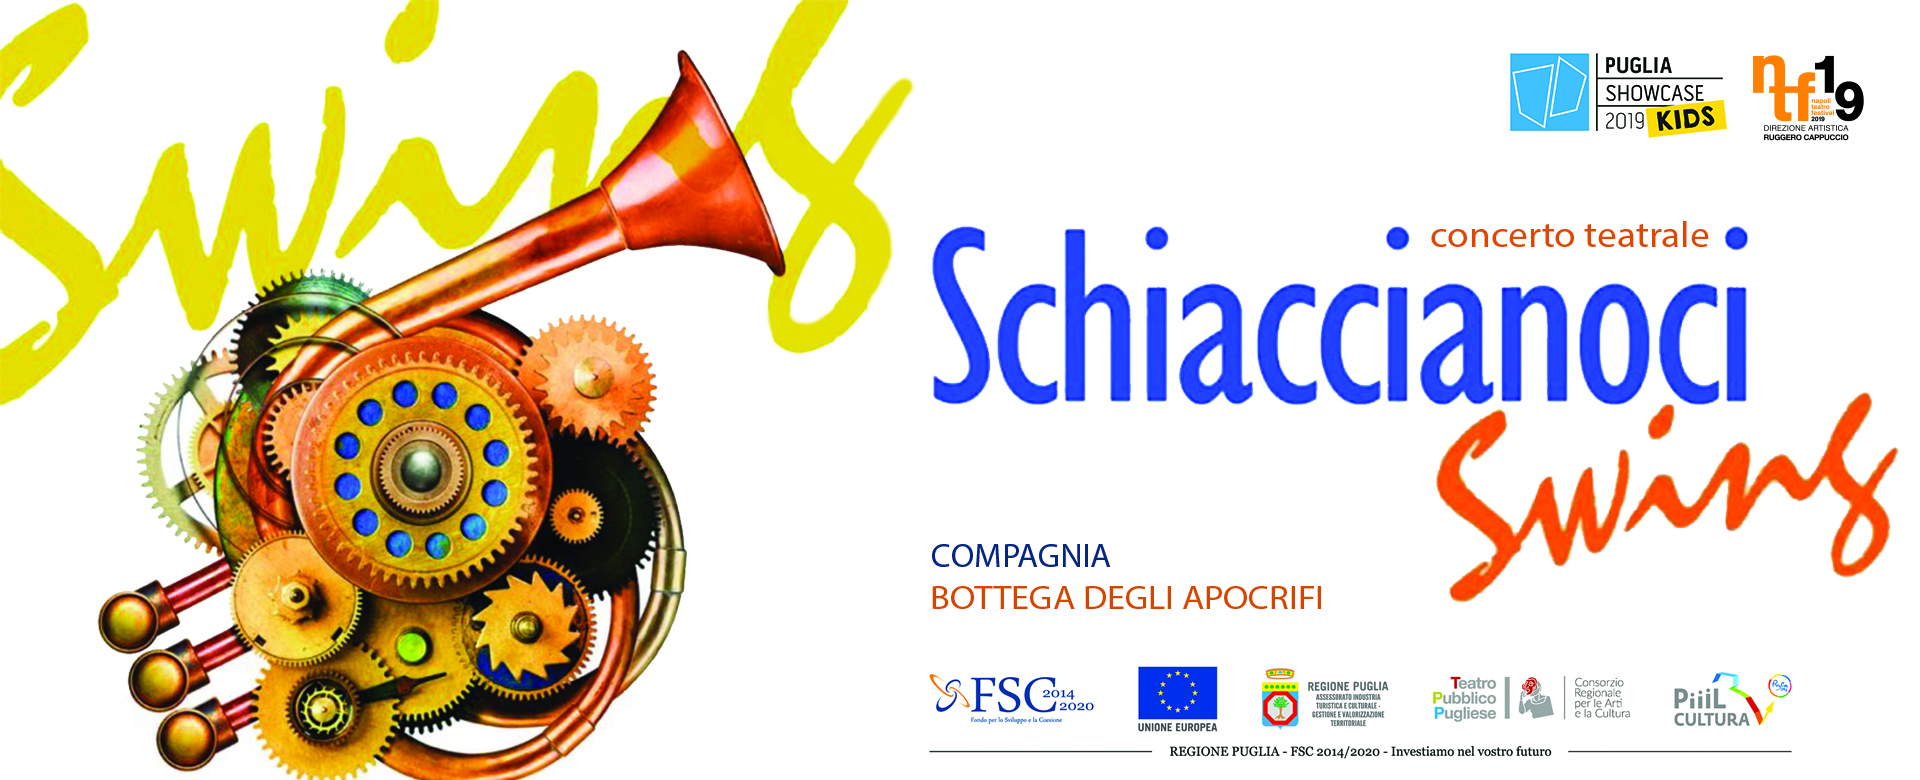 SCHIACCIANOCI SWING_ Puglia Showcase